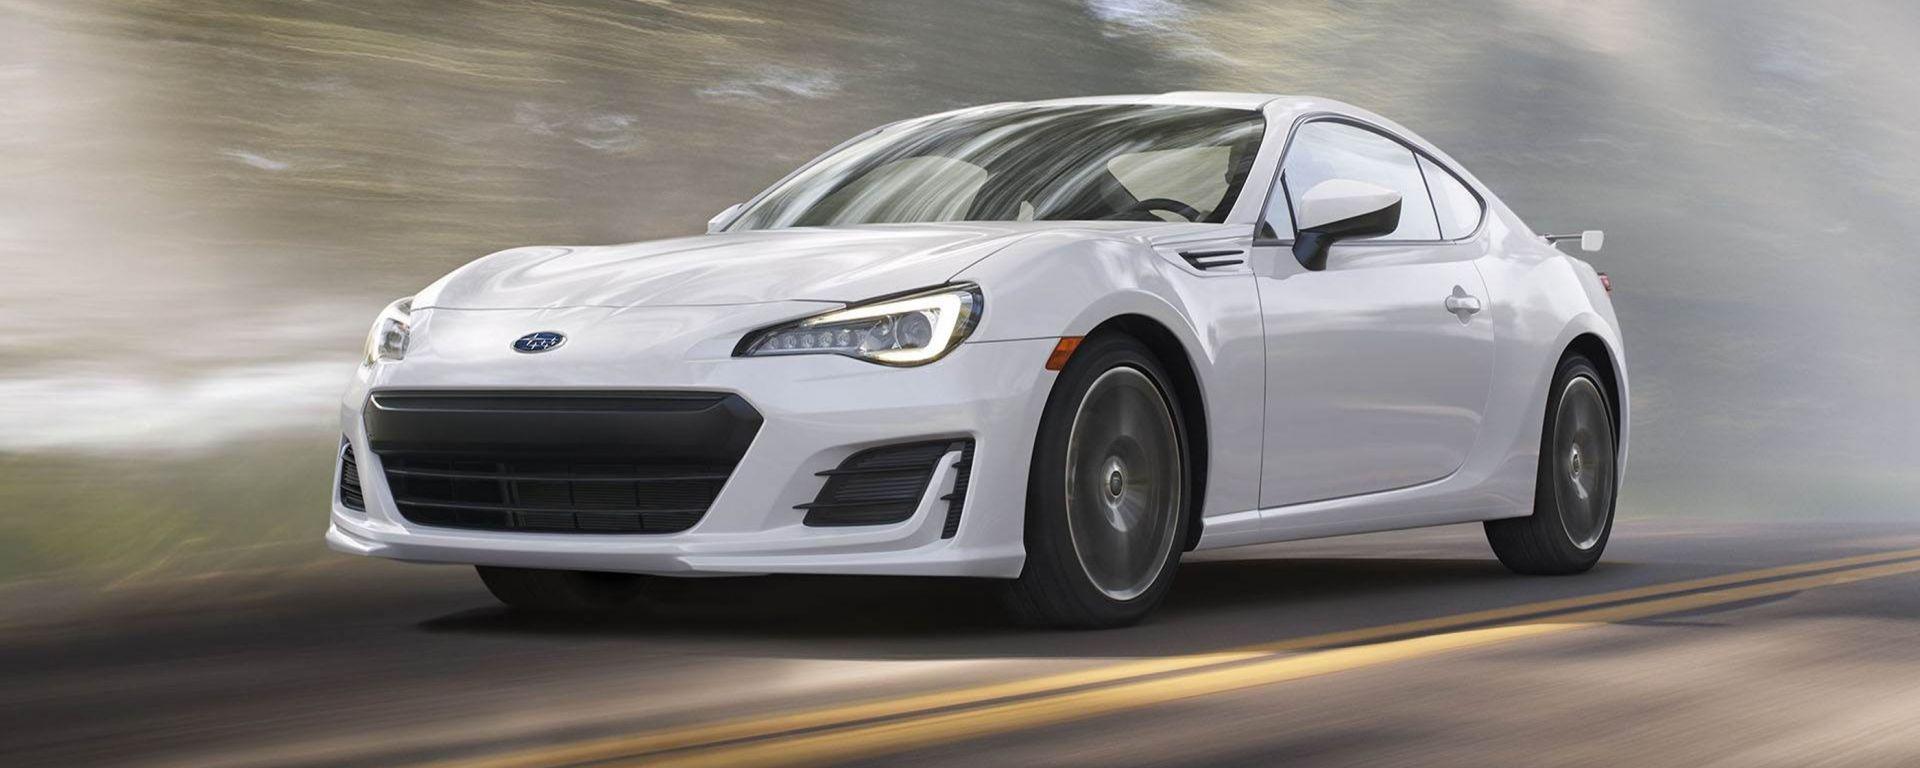 Subaru BRZ: rinnovata la versione USA